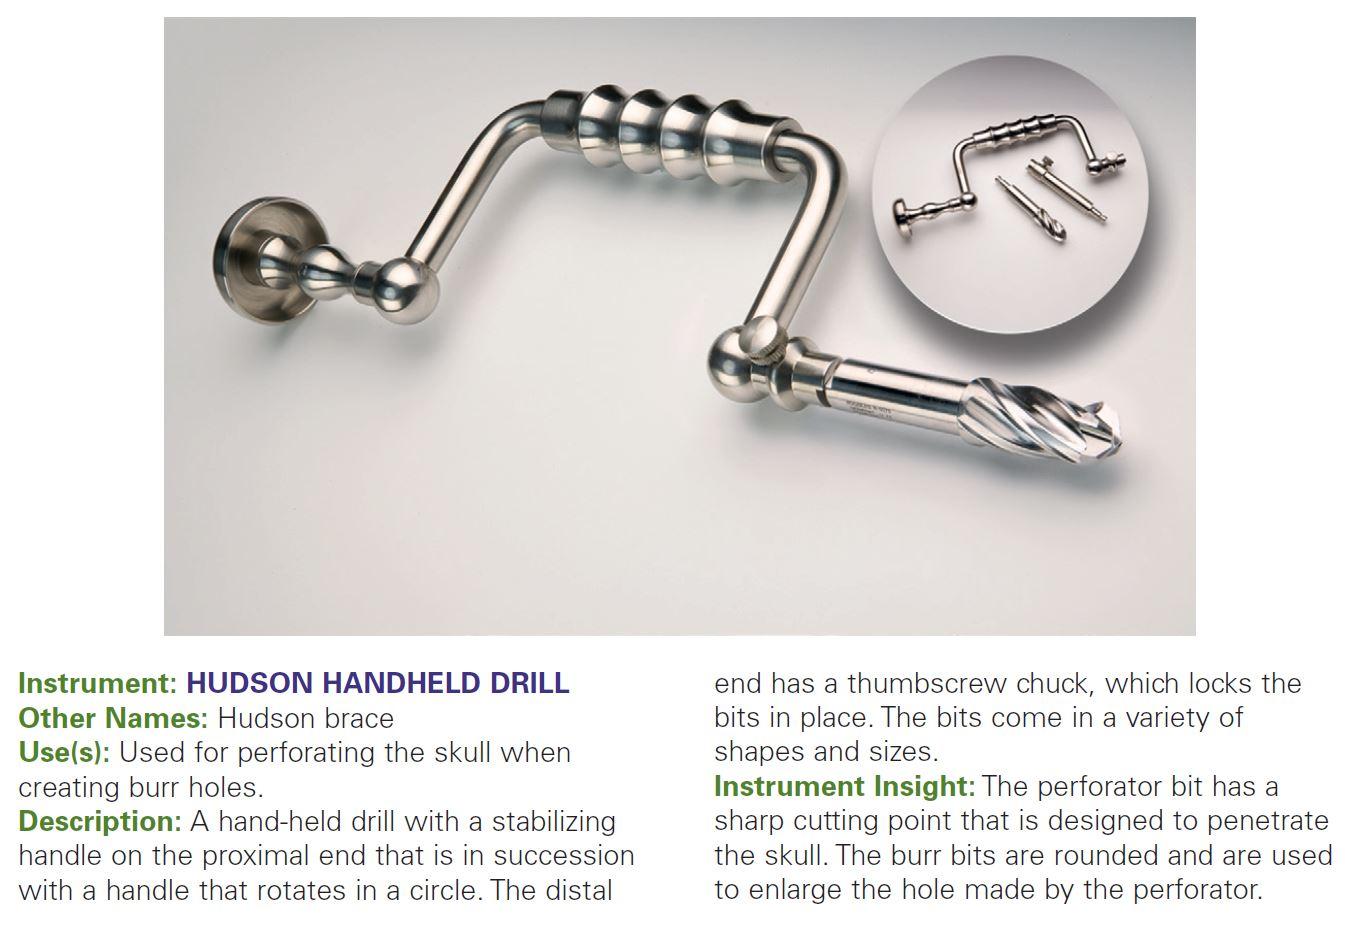 HUDSON HANDHELD DRILL